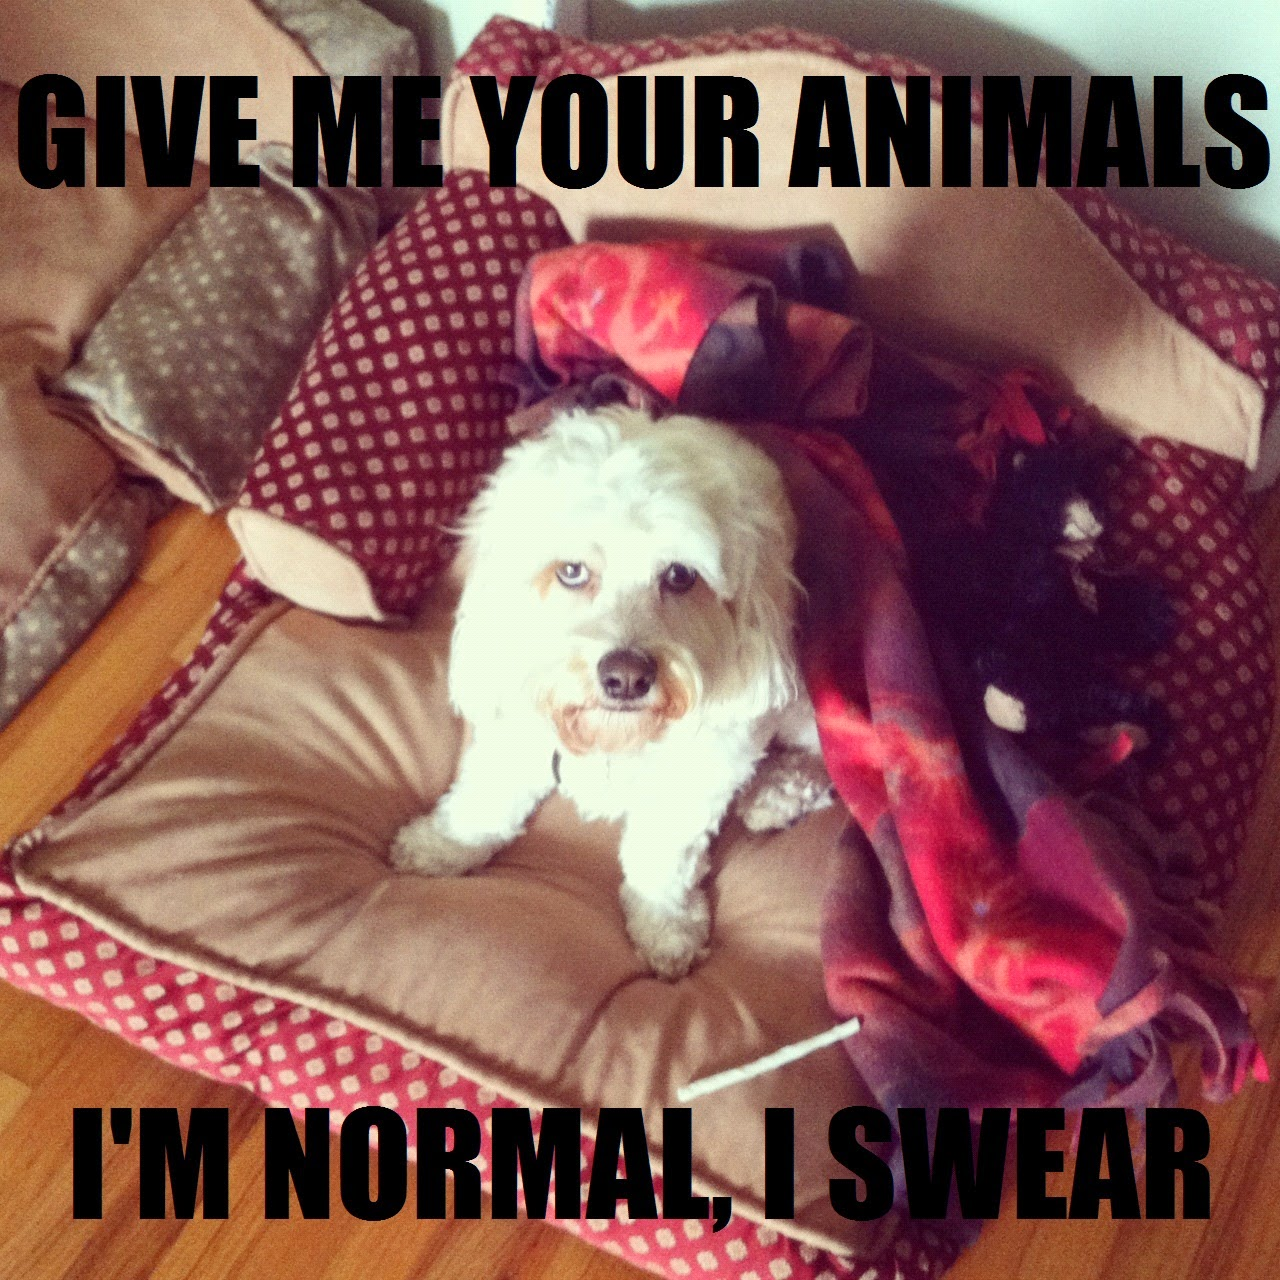 i'm normal i swear